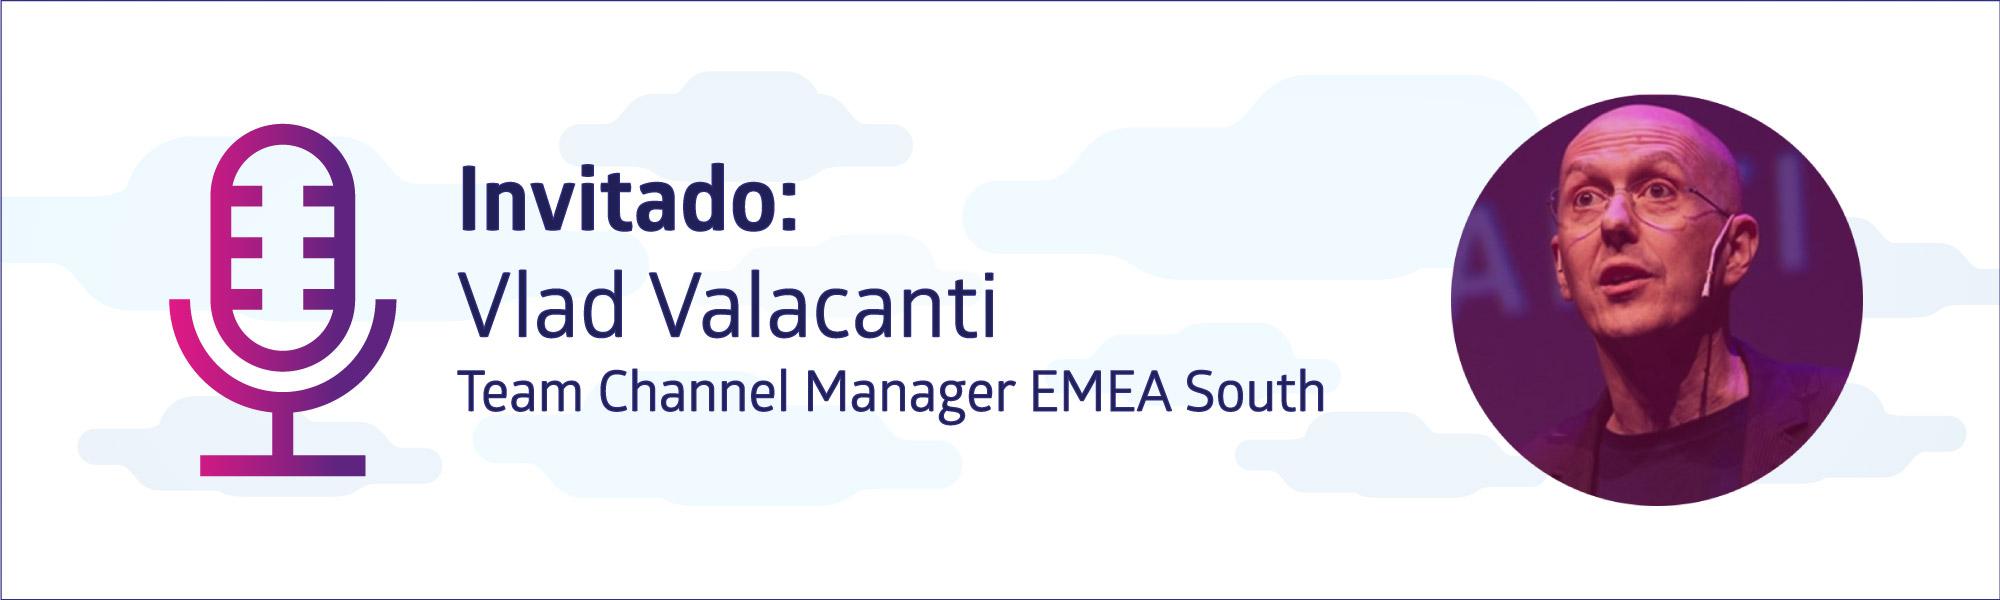 Vlad Cavalcanti,  Team Channel Manager EMEA South de Atlassian